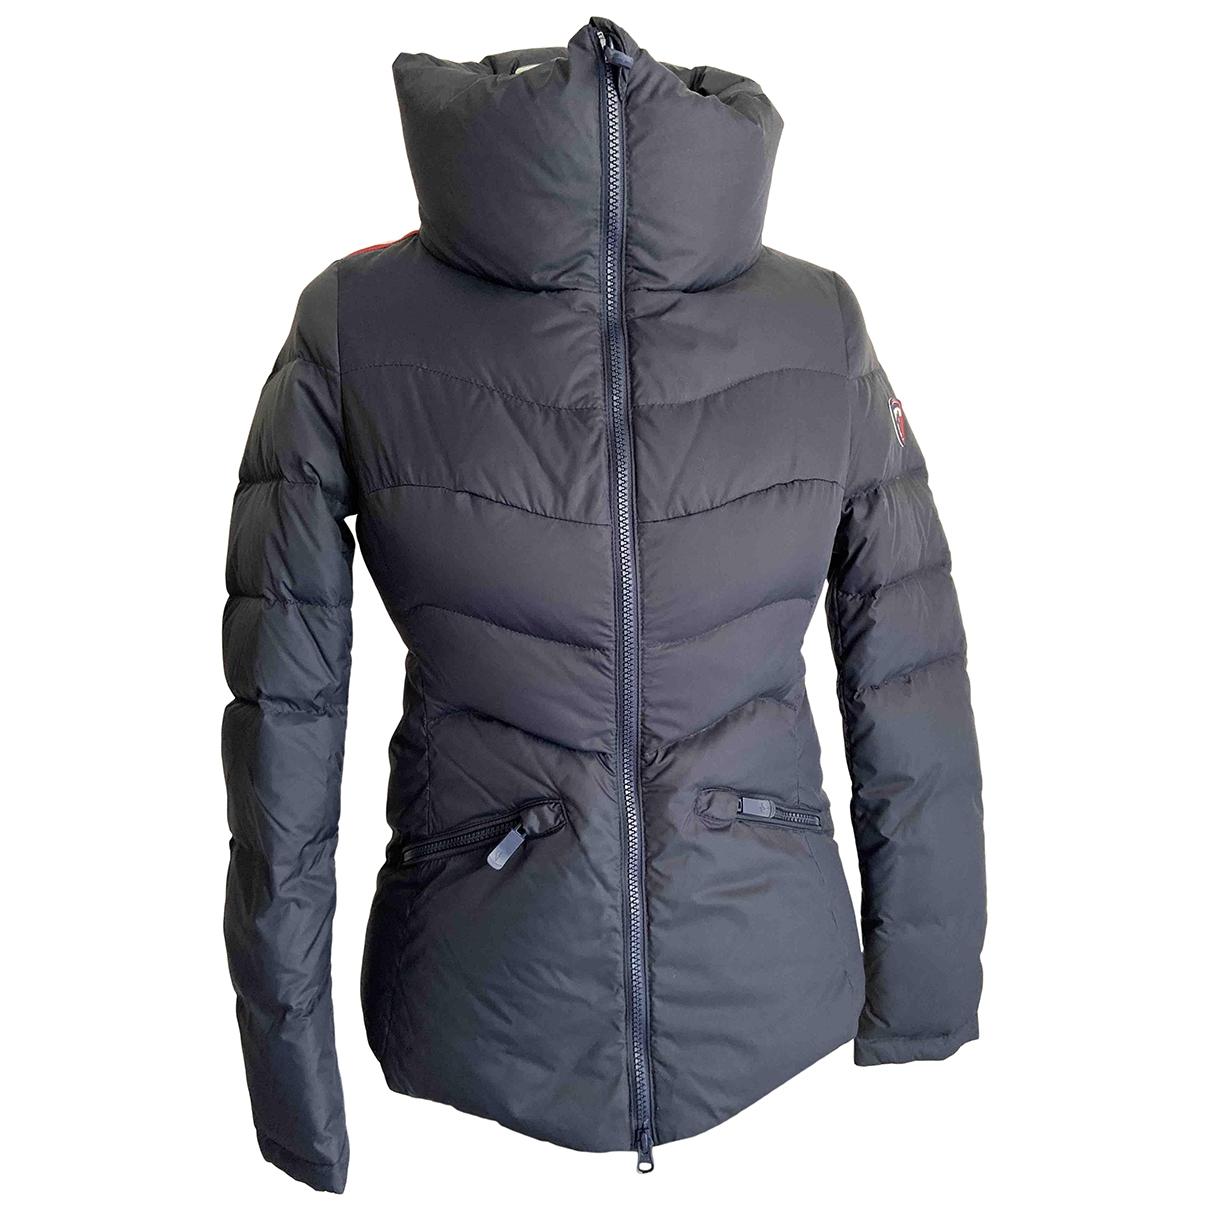 Rossignol \N Navy Leather jacket for Women XS International